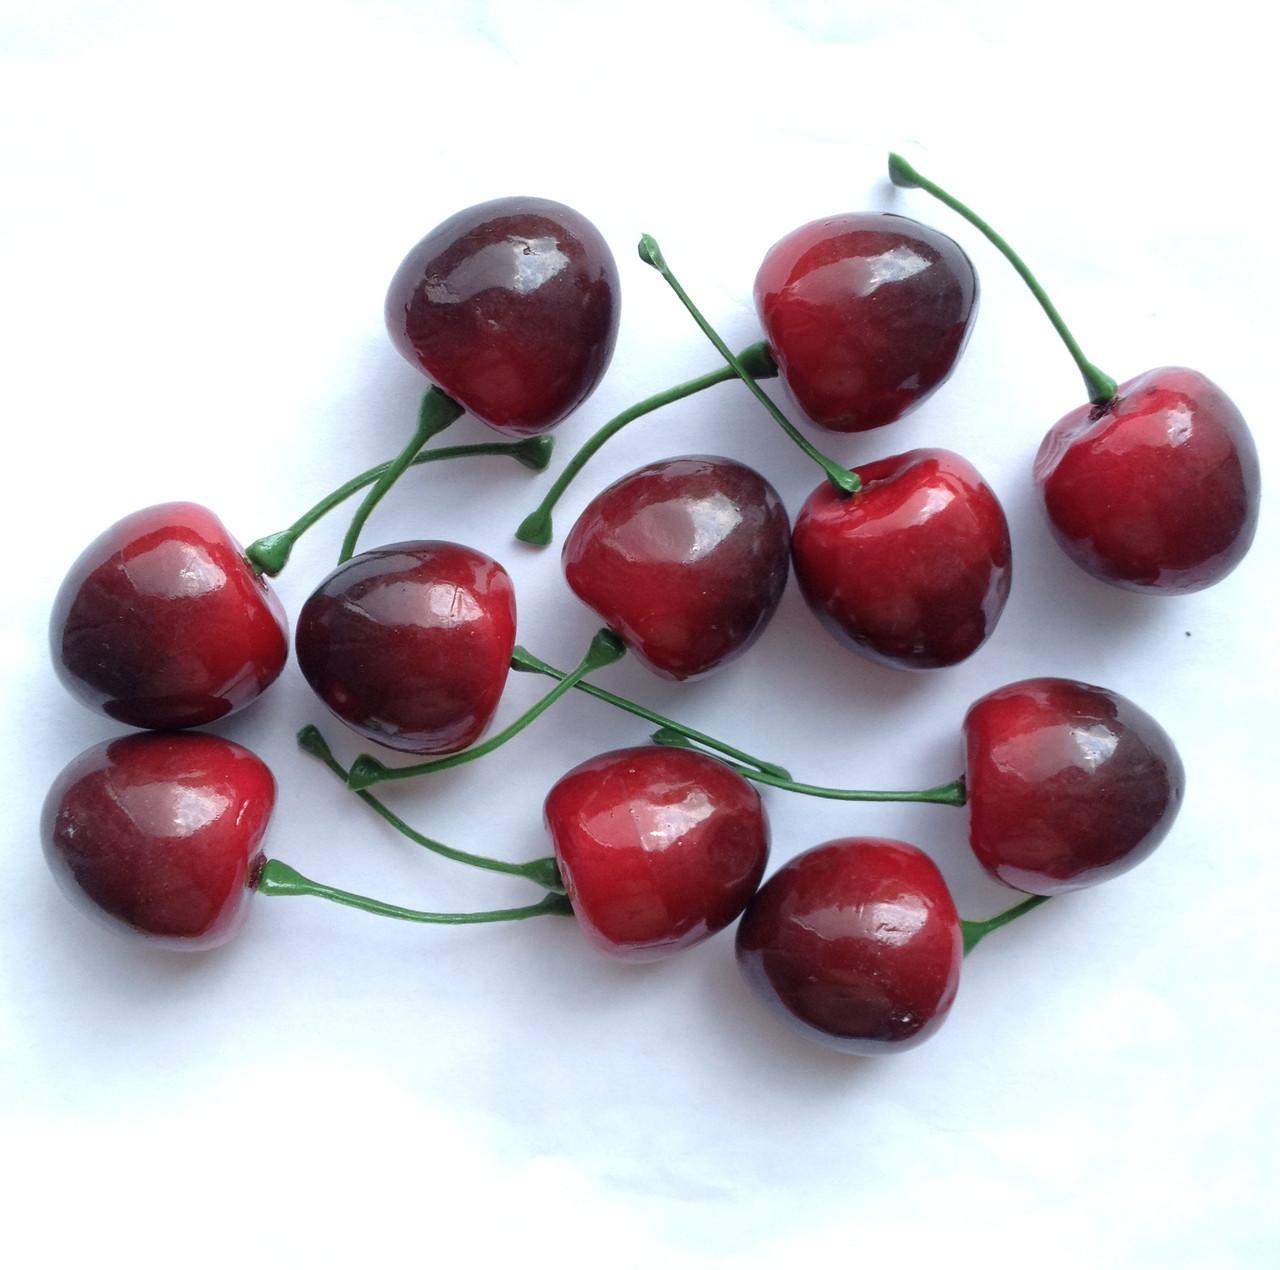 Ветка вишни, черешня (50 шт. в уп.)